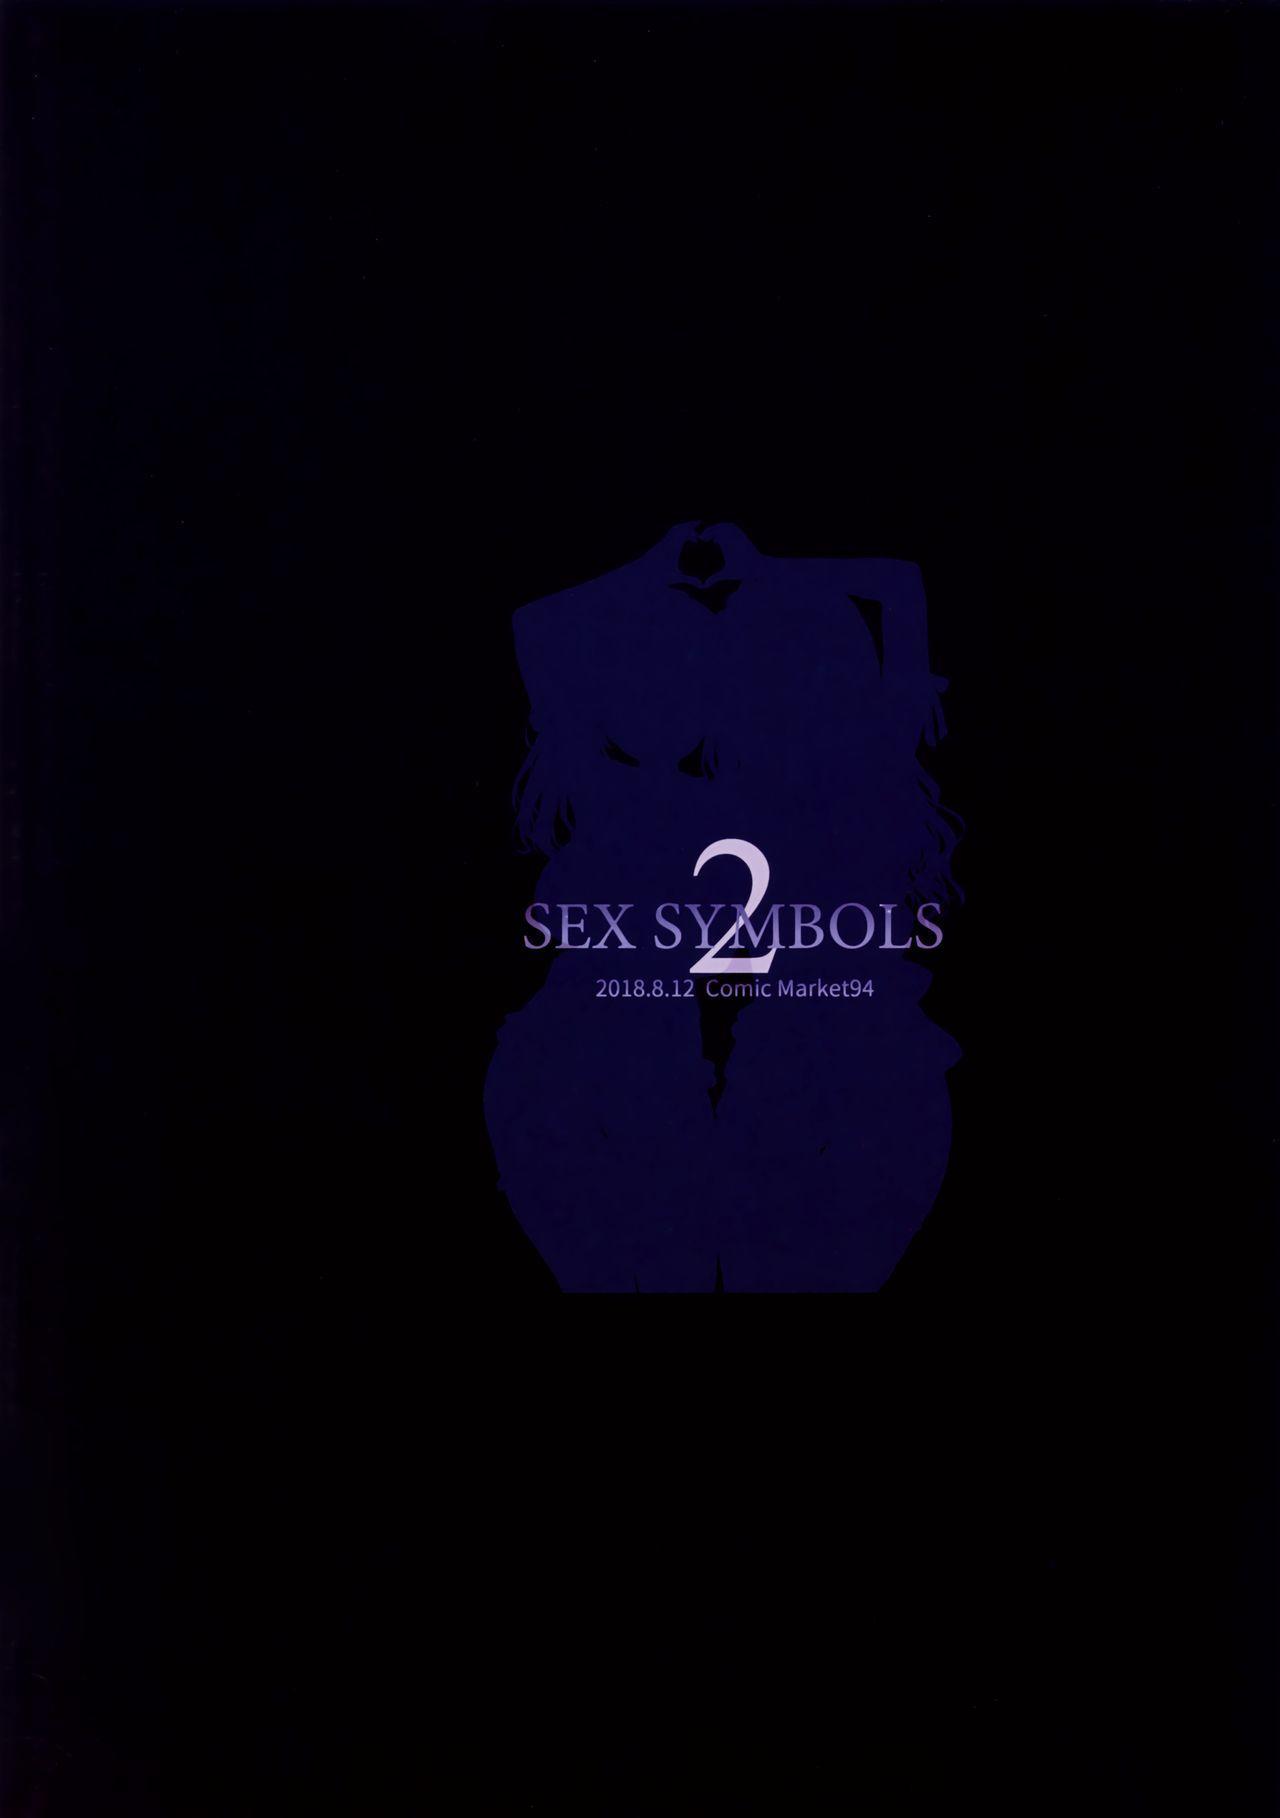 SEX SYMBOLS 2 25